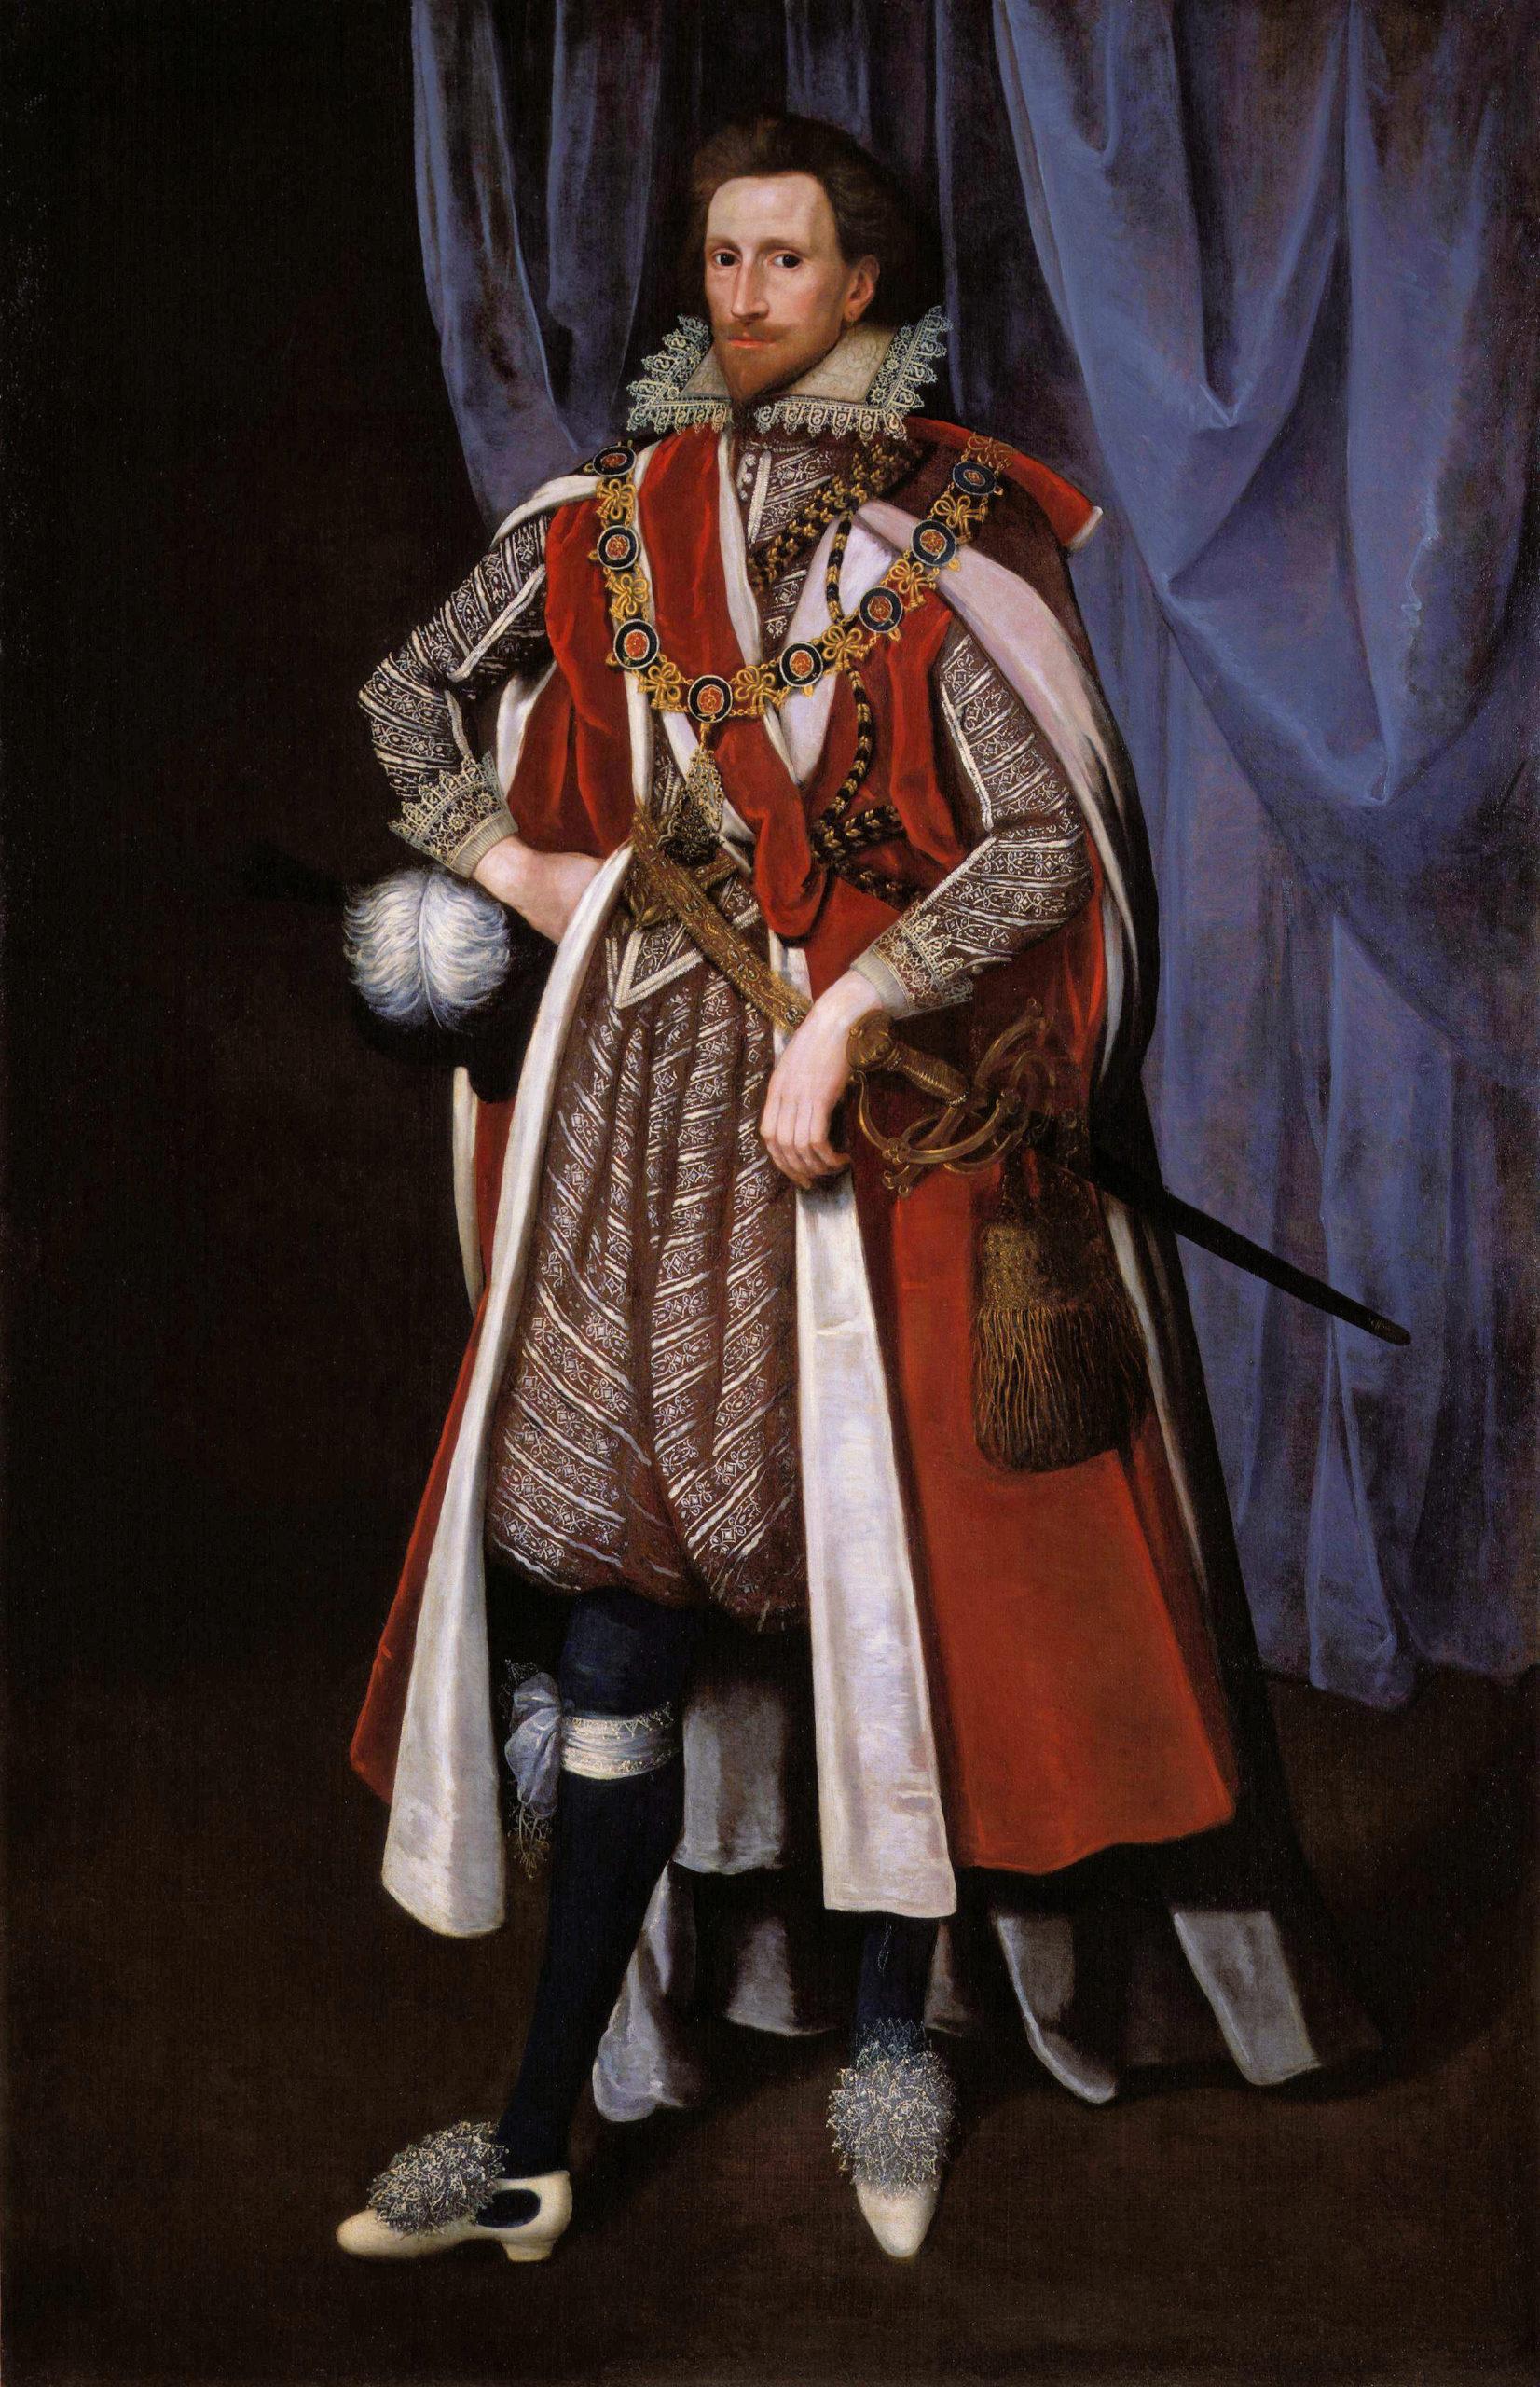 Philip Herbert, Earl of Montgomery and Pembroke